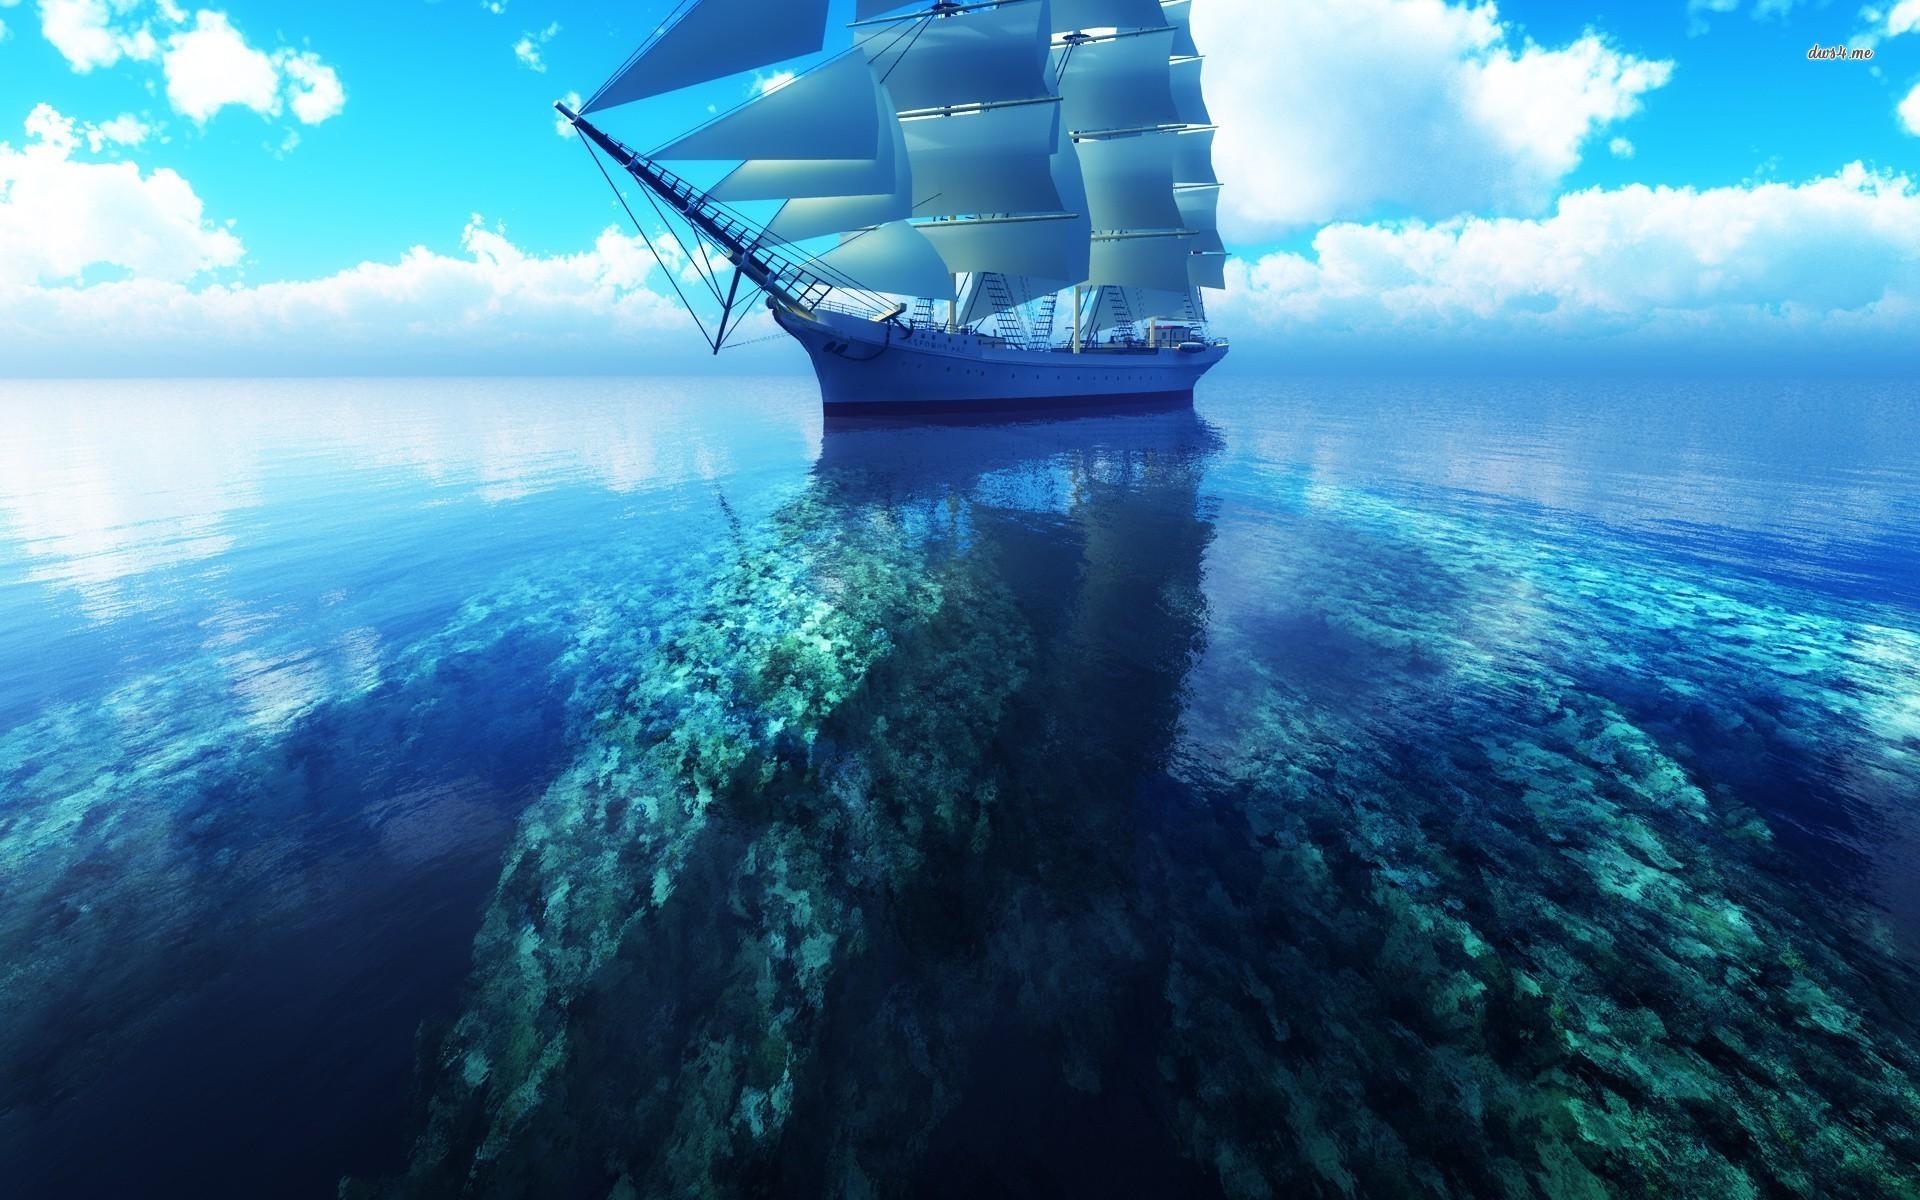 HD Sailboat Wallpaper